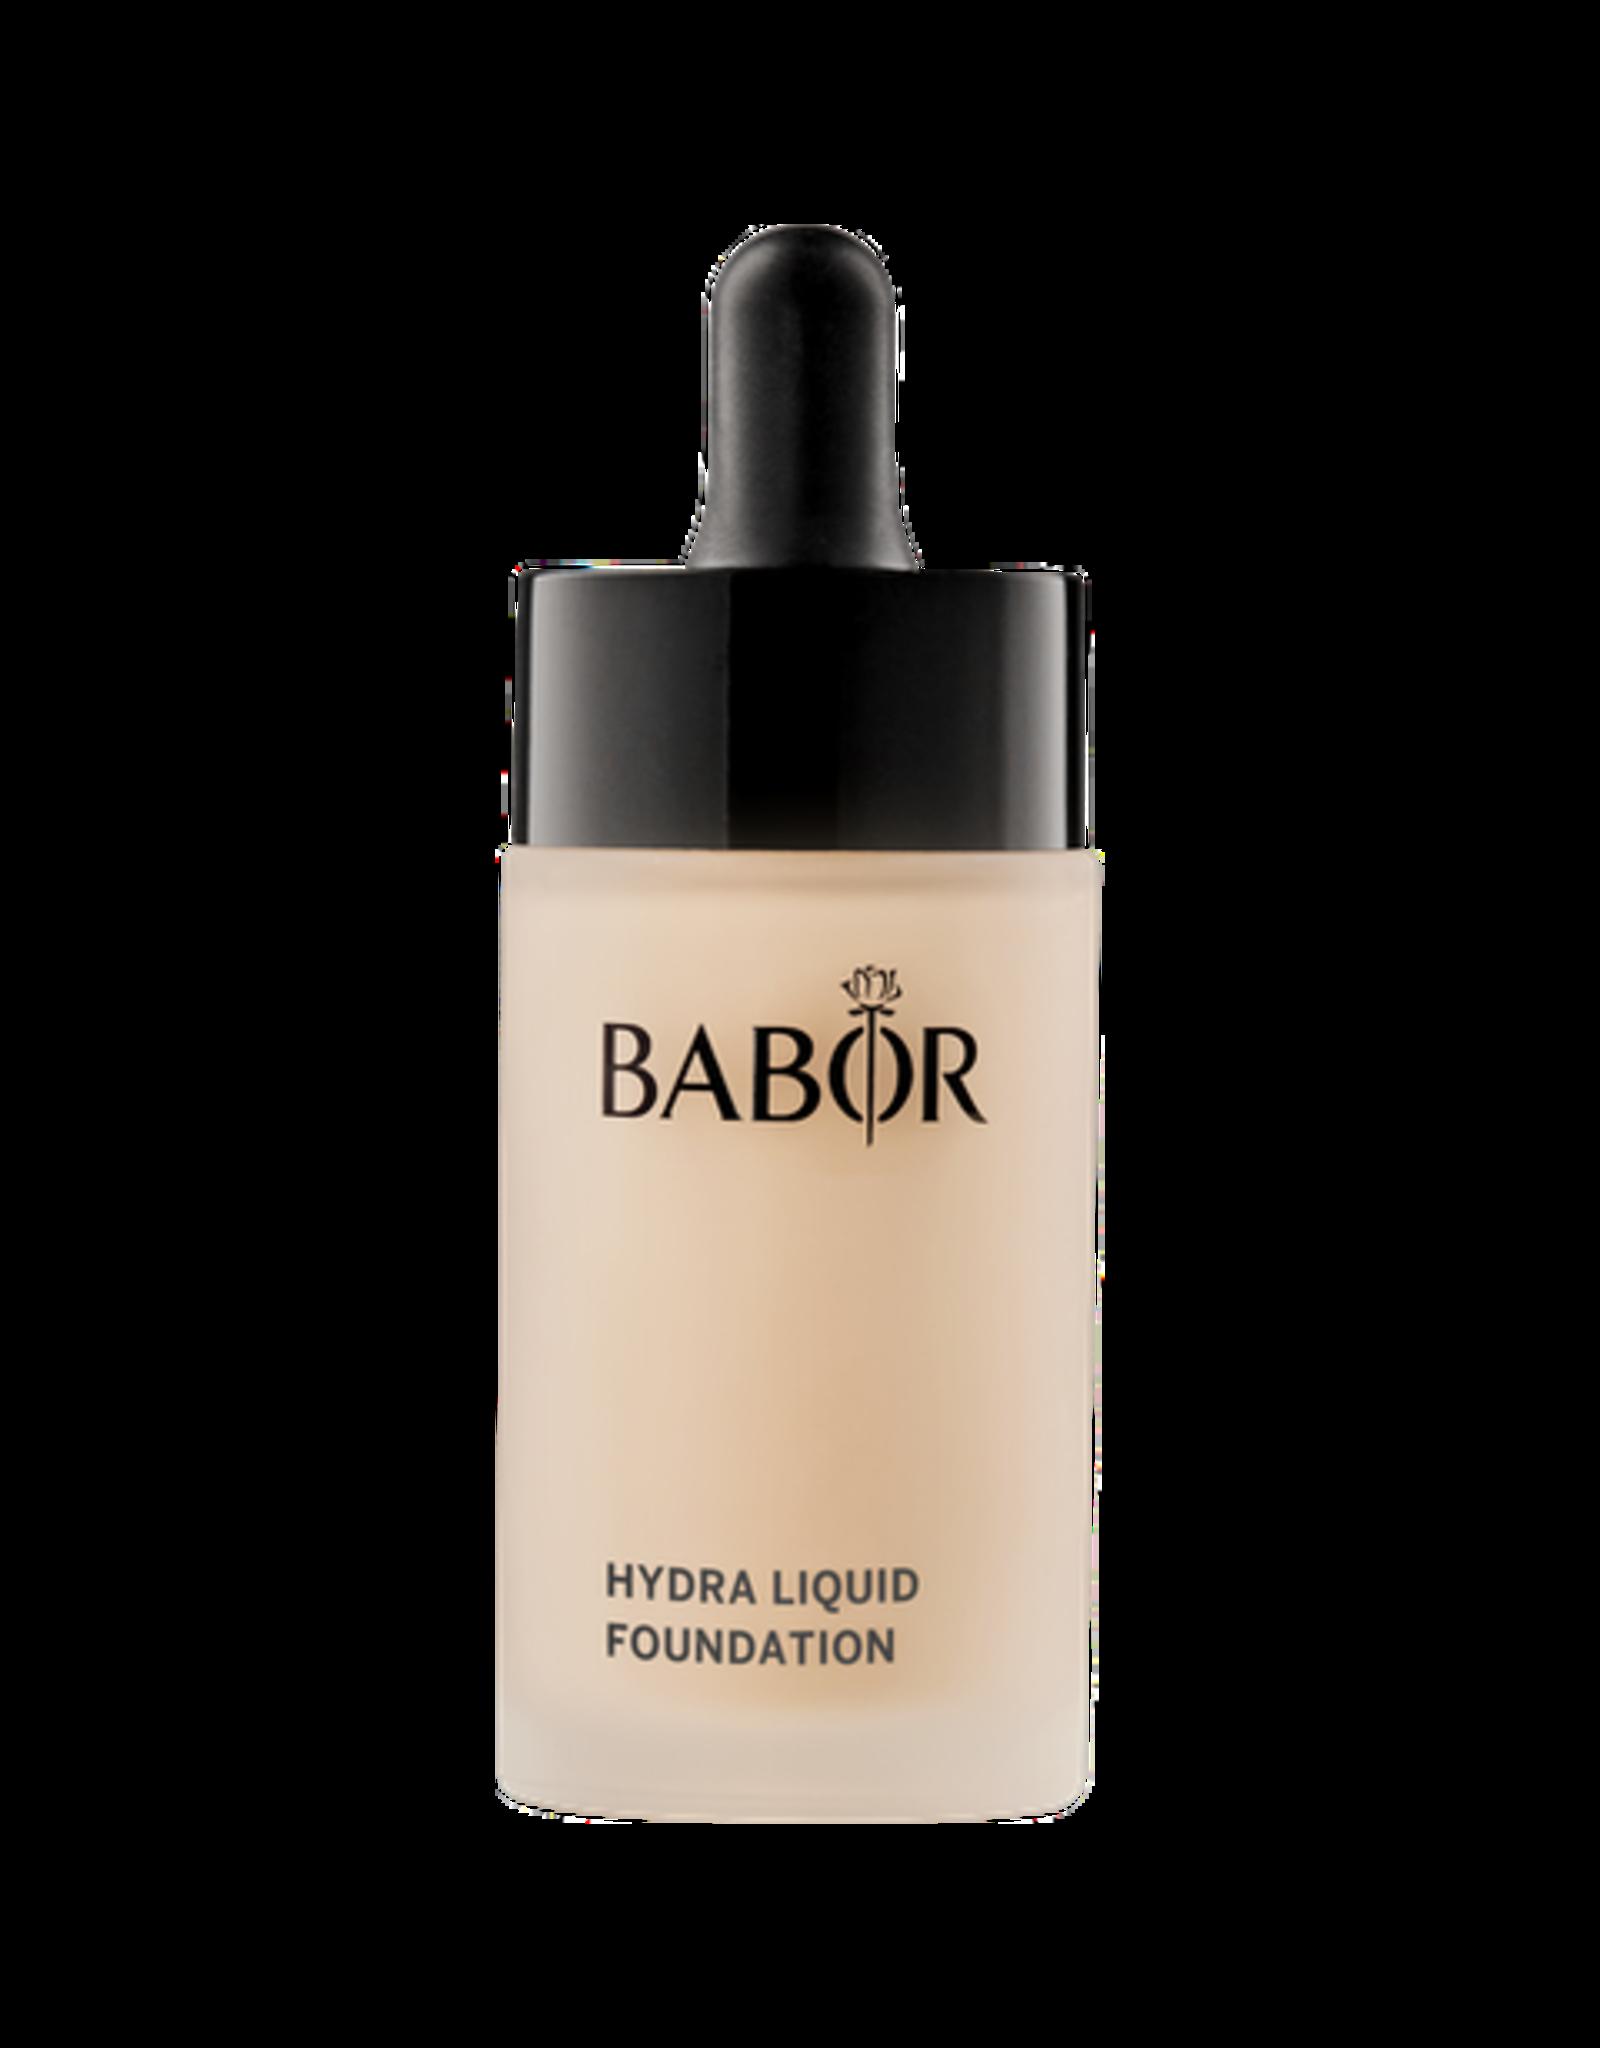 BABOR HYDRA LIQUID FOUNDATION 05 IVORY